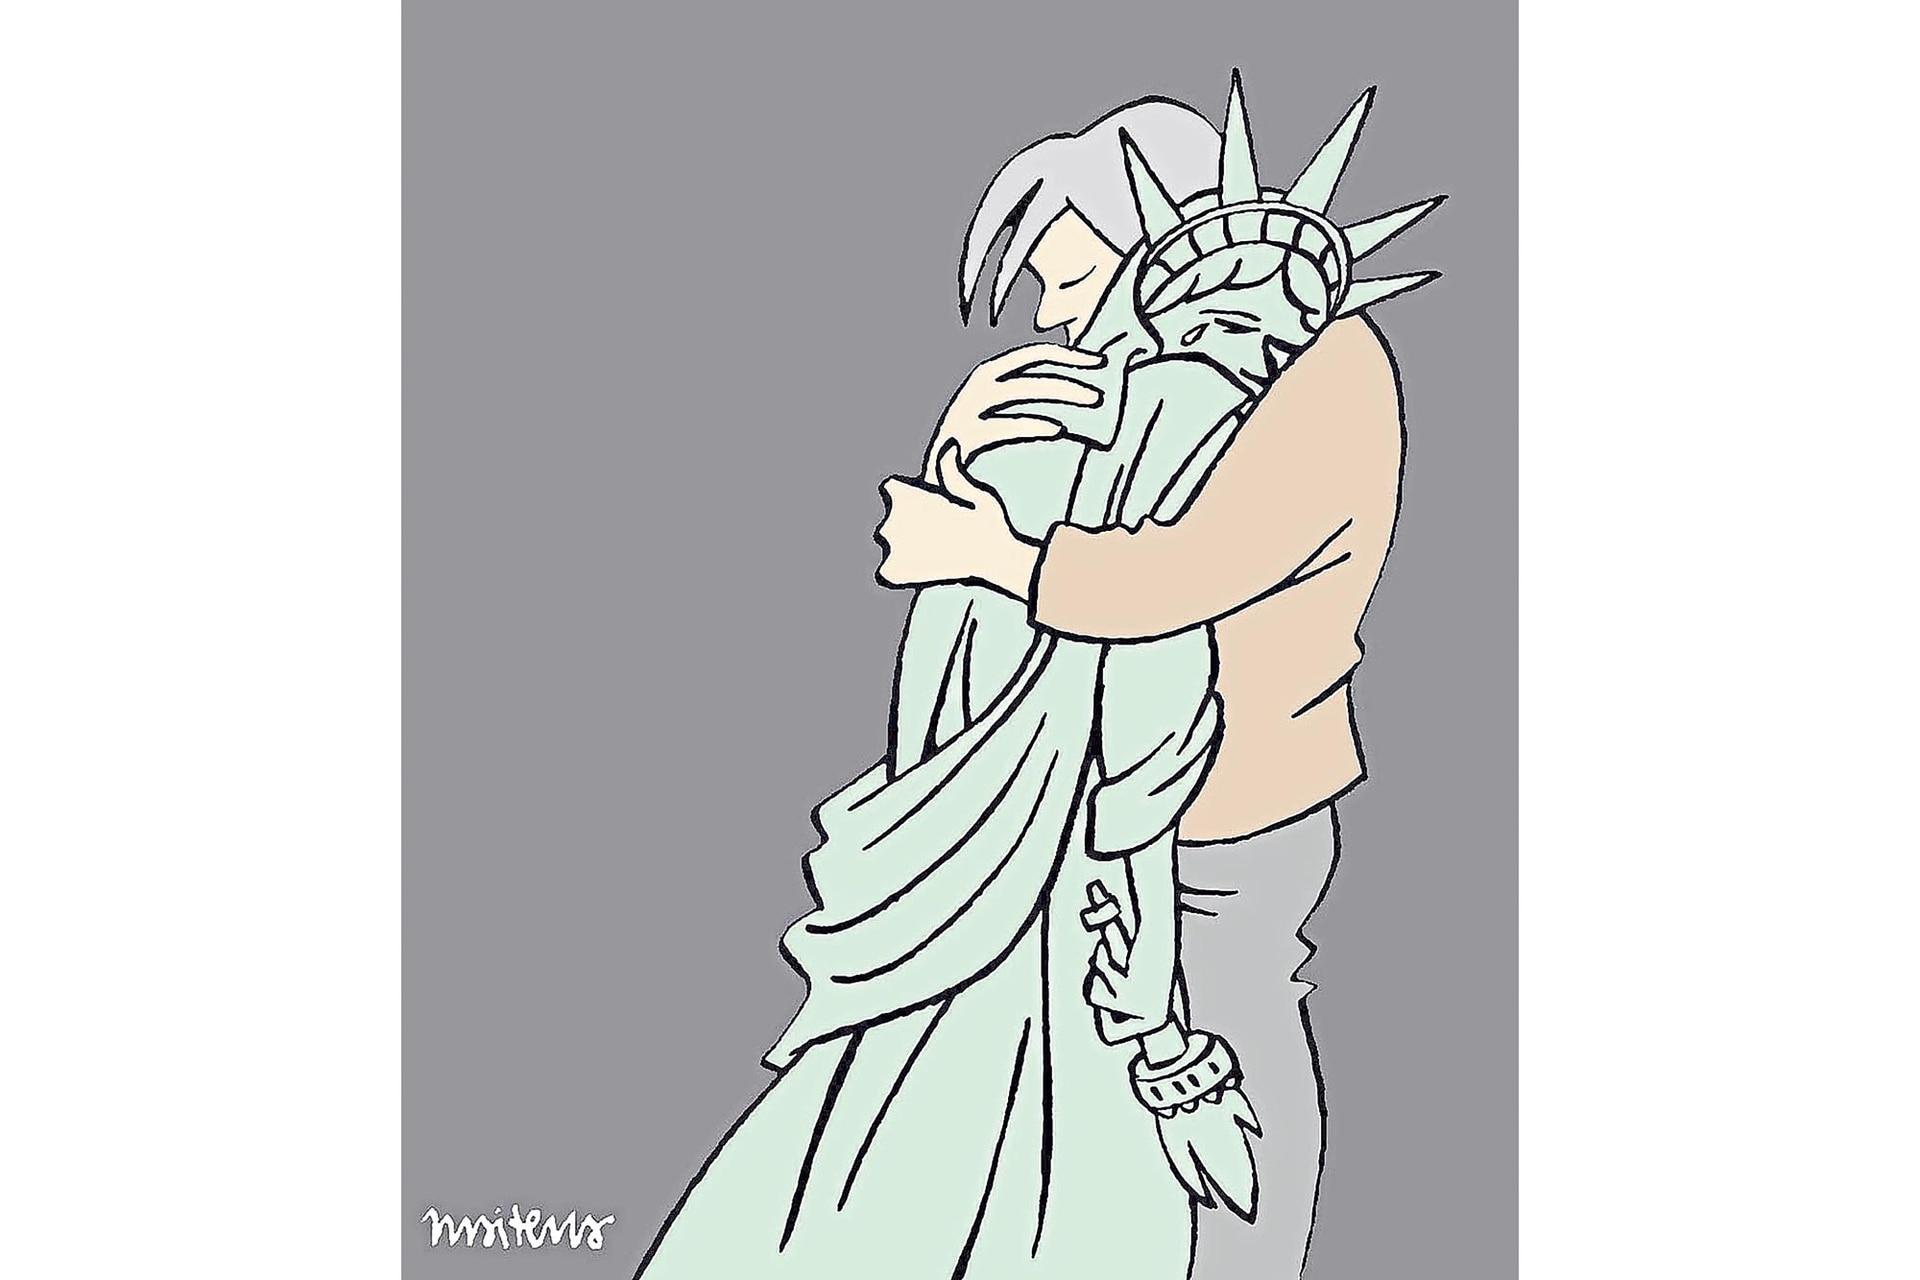 La Estatua de la Libertad, dos días después de los ataques del 11 de septiembre de 2001